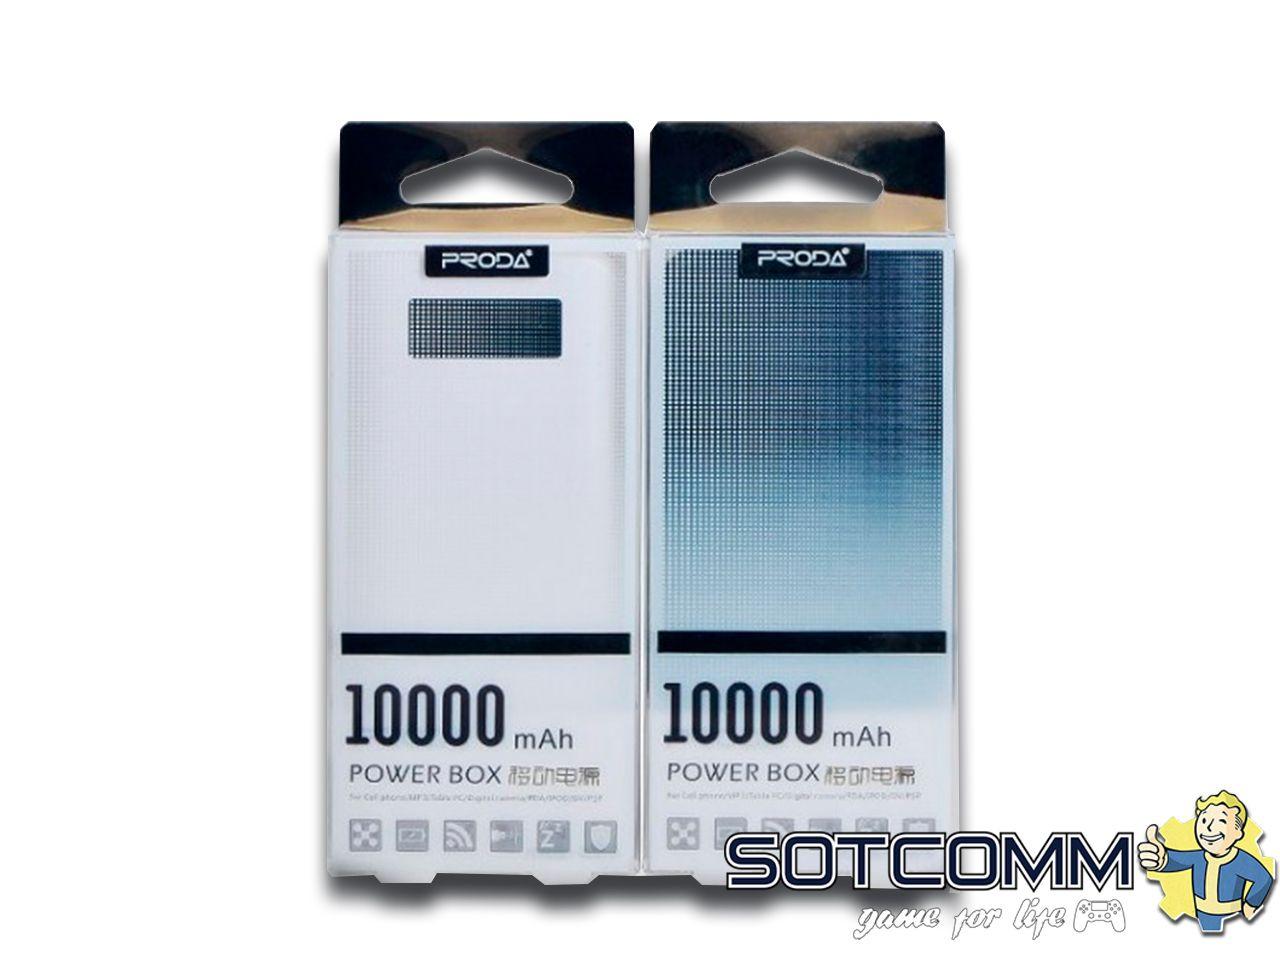 Remax Proda Power Box 10000mAh